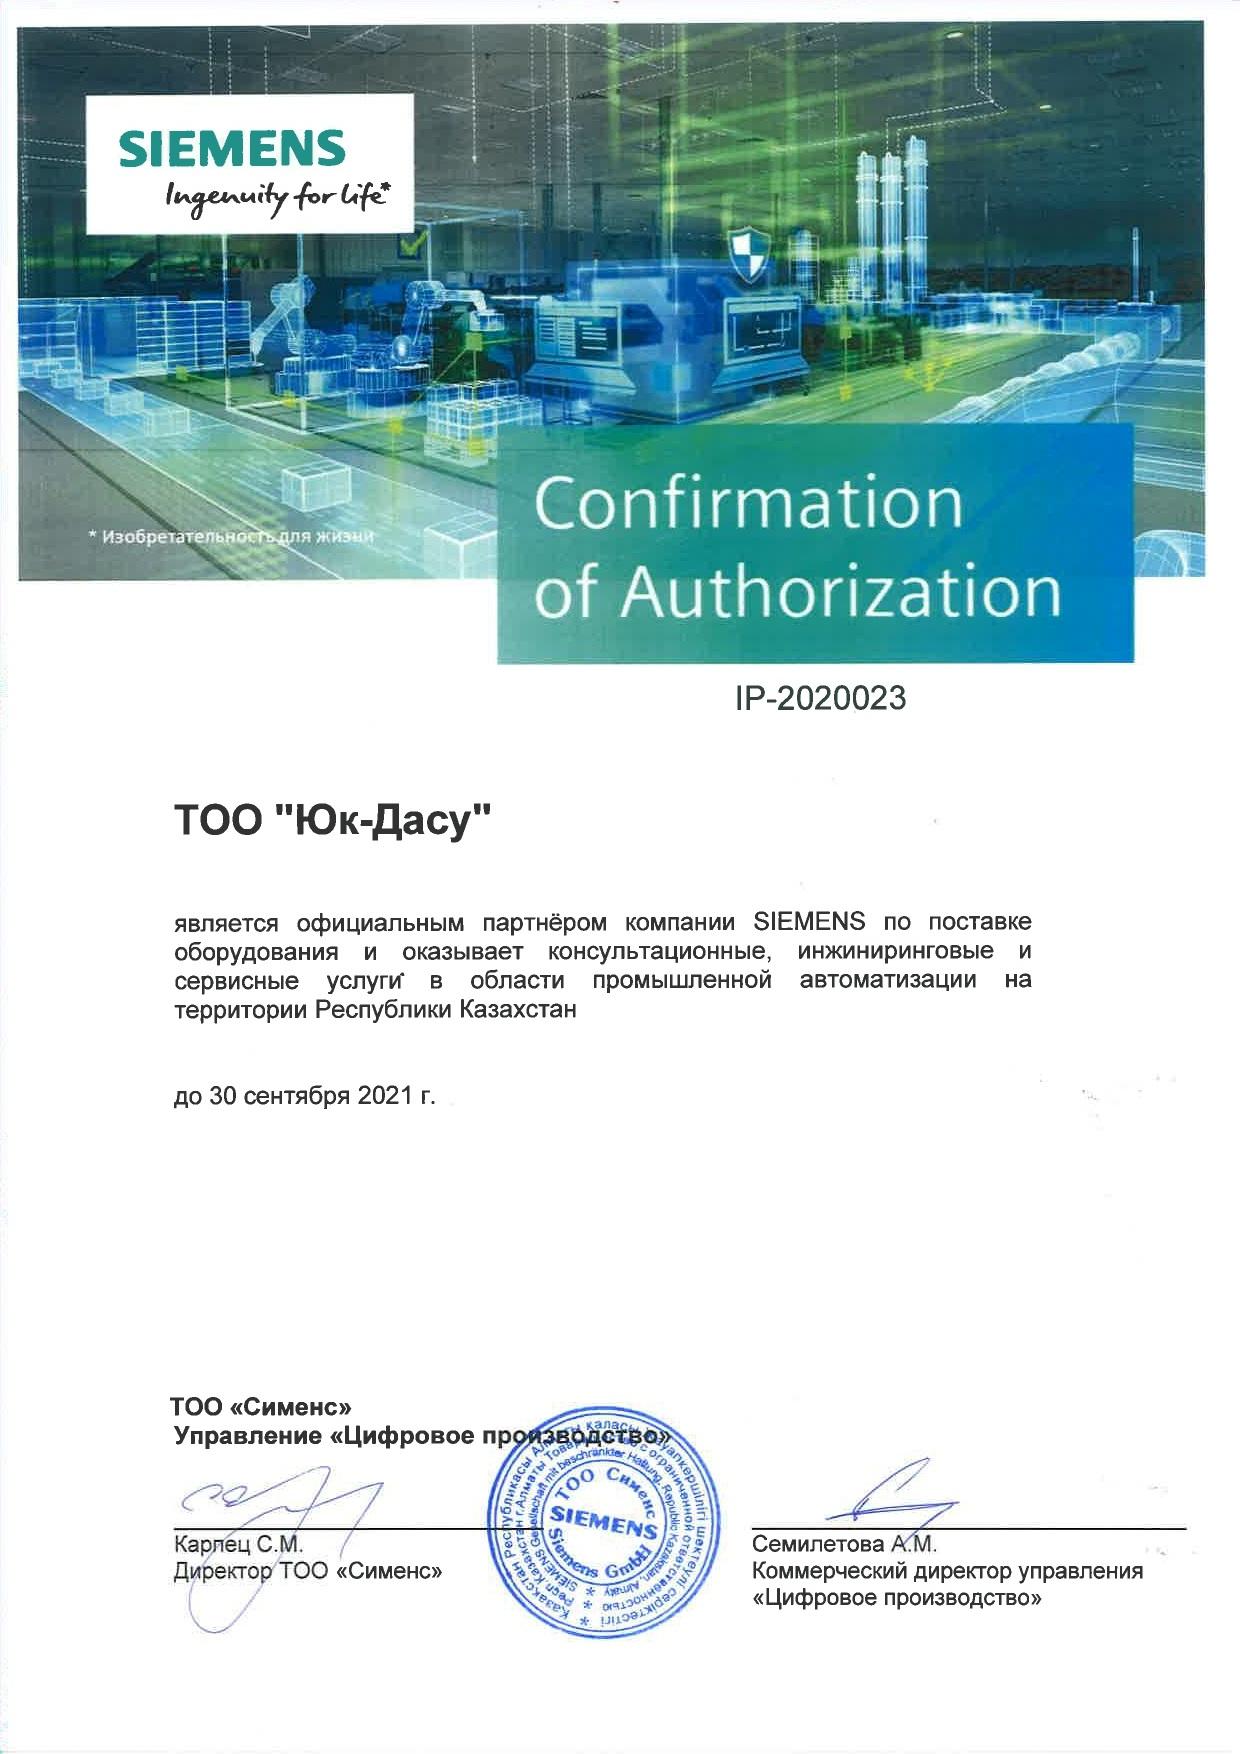 Сертификат до Siemens 2021 г.